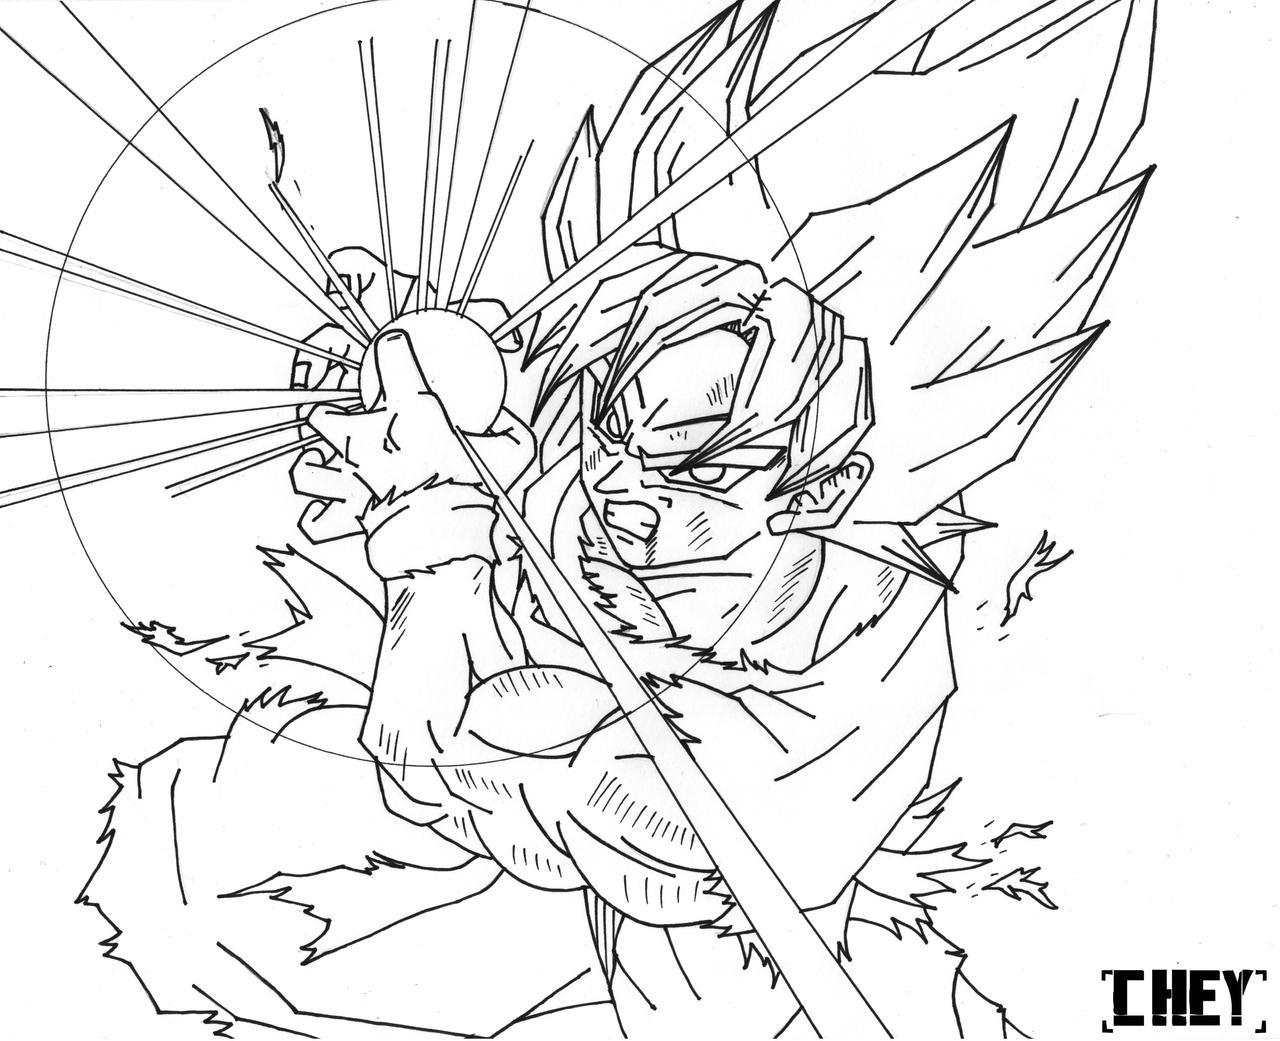 Goku Ssj Kamehameha! [Lineart] by cheygipe on DeviantArt